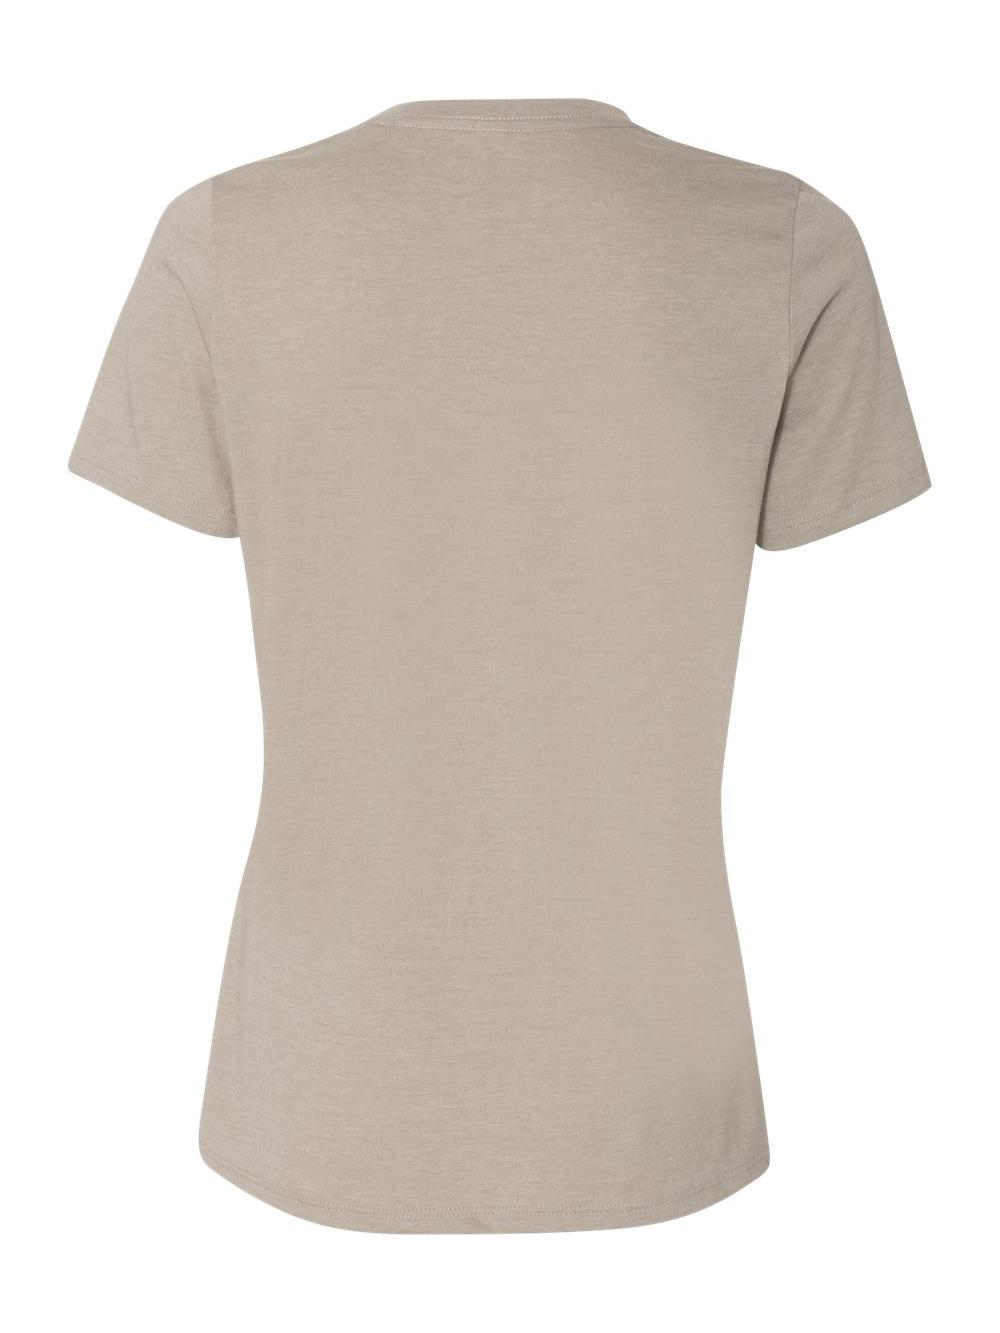 Bella-Canvas-Women-039-s-Relaxed-Short-Sleeve-Jersey-Tee-6400 thumbnail 52